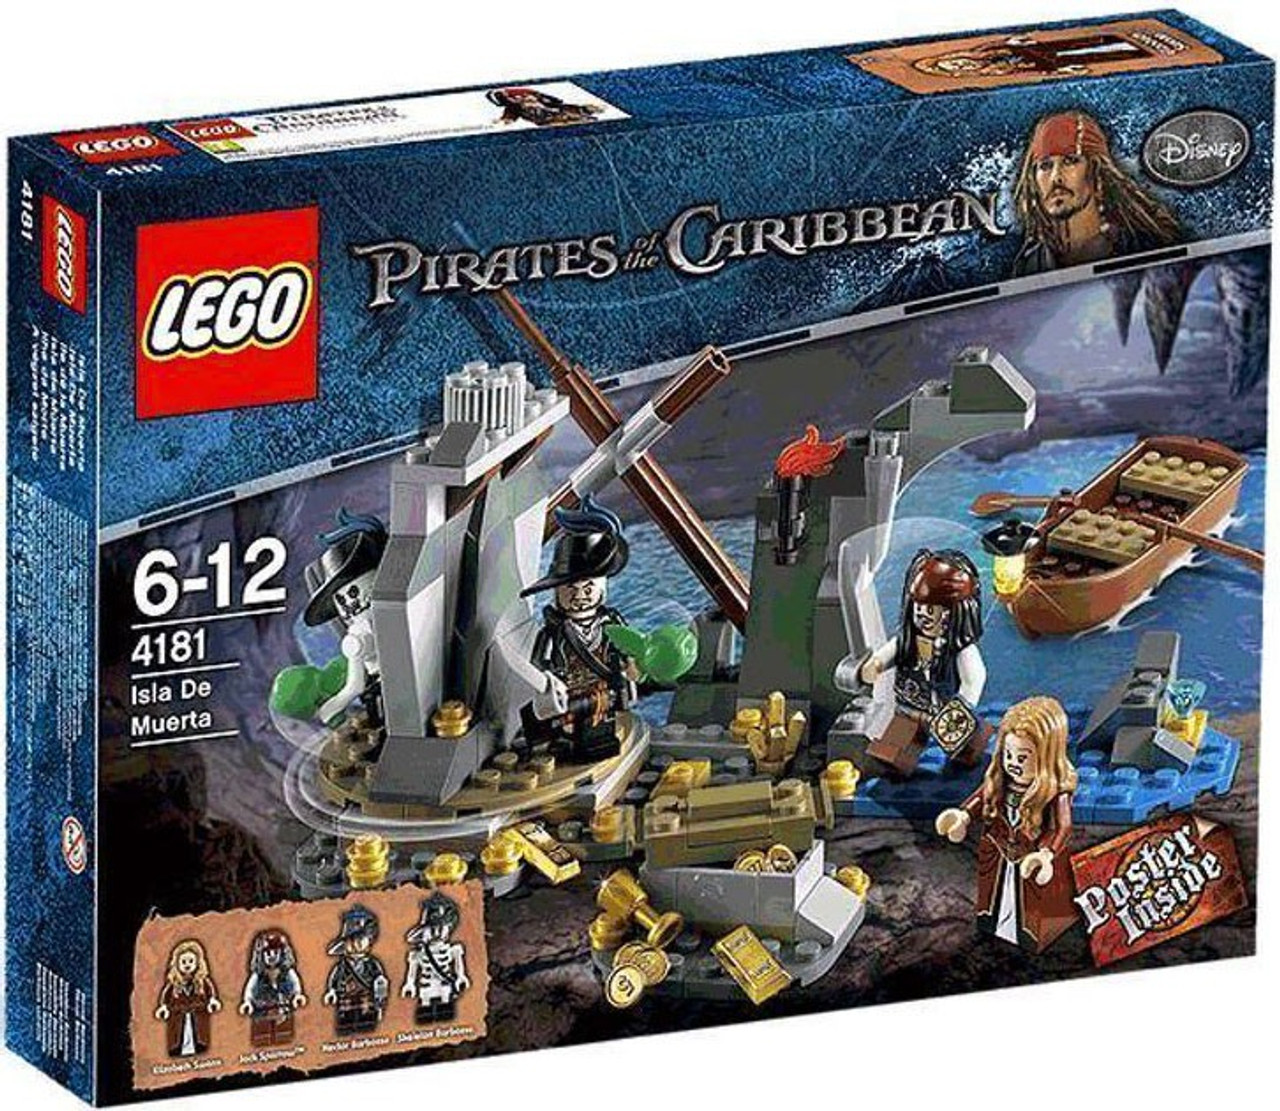 Lego Pirates Of The Caribbean Isla De Muerta Set 4181 Toywiz